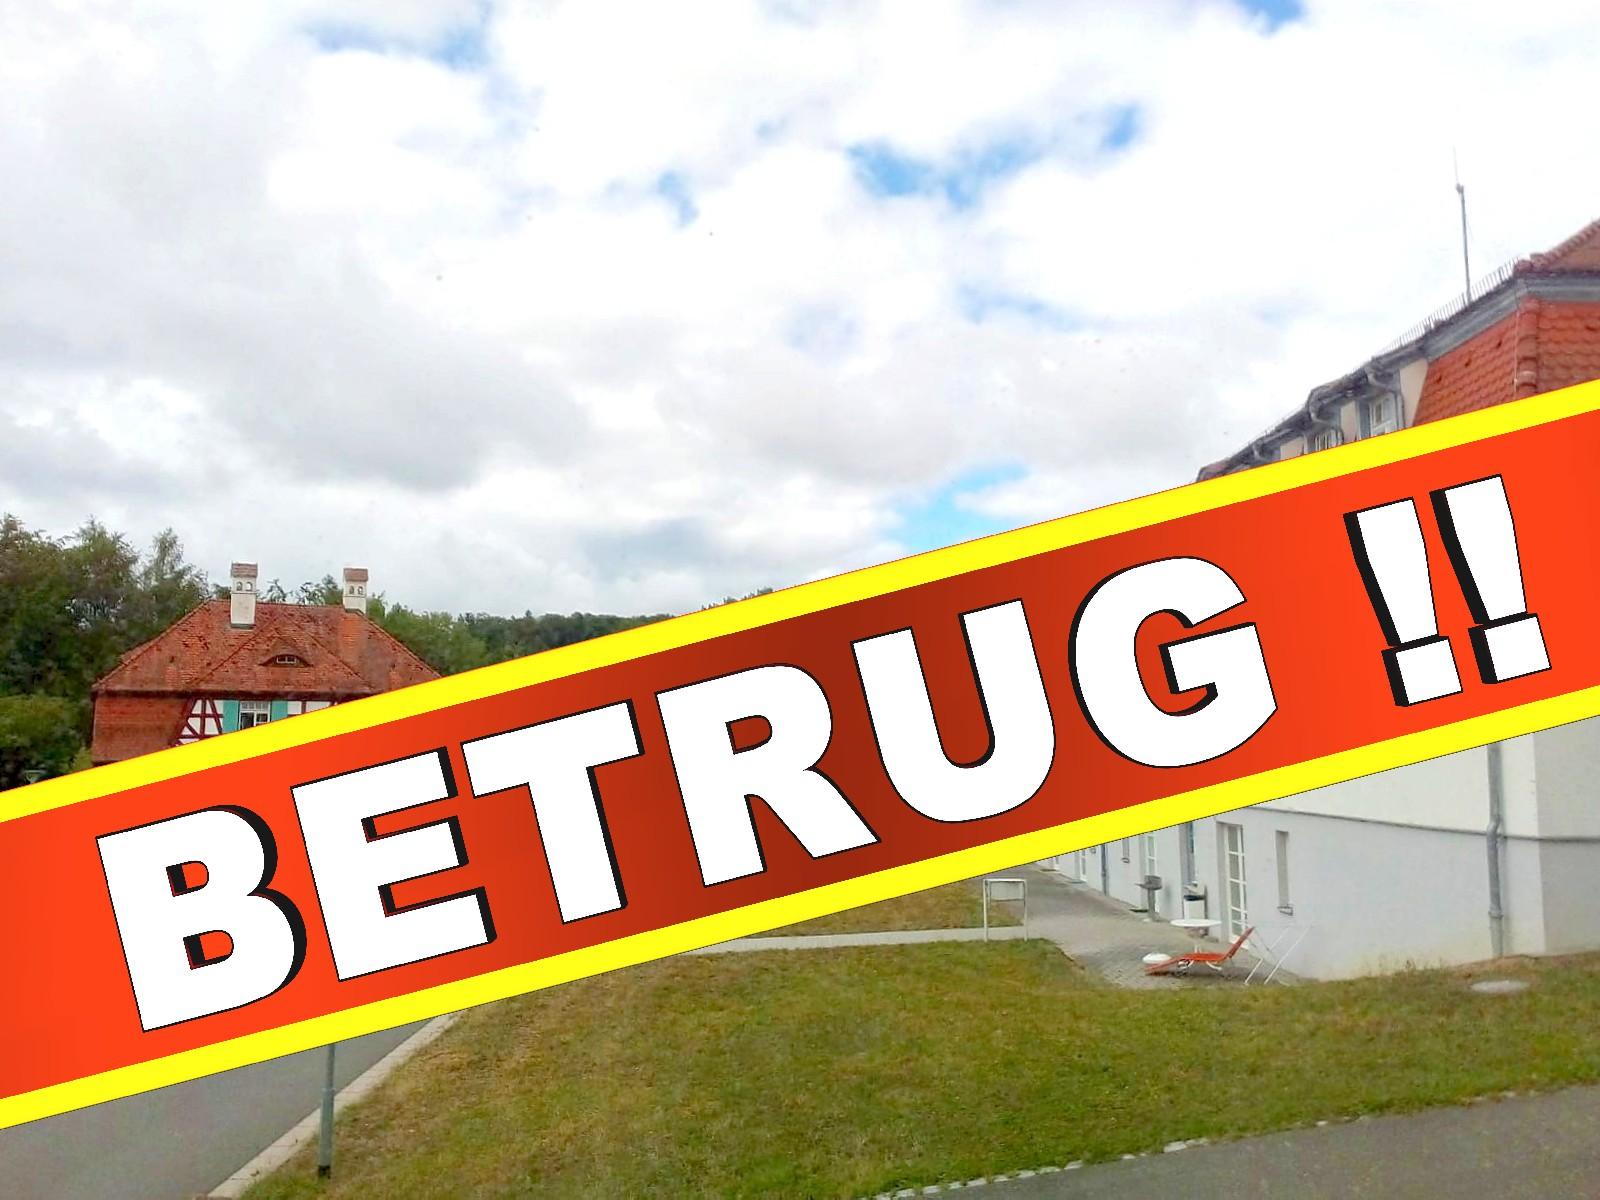 Bezirksklinikum Obermain Kutzenberg, 96250 Ebensfeld Psychiatrie Polizei Krankenhaus (55)